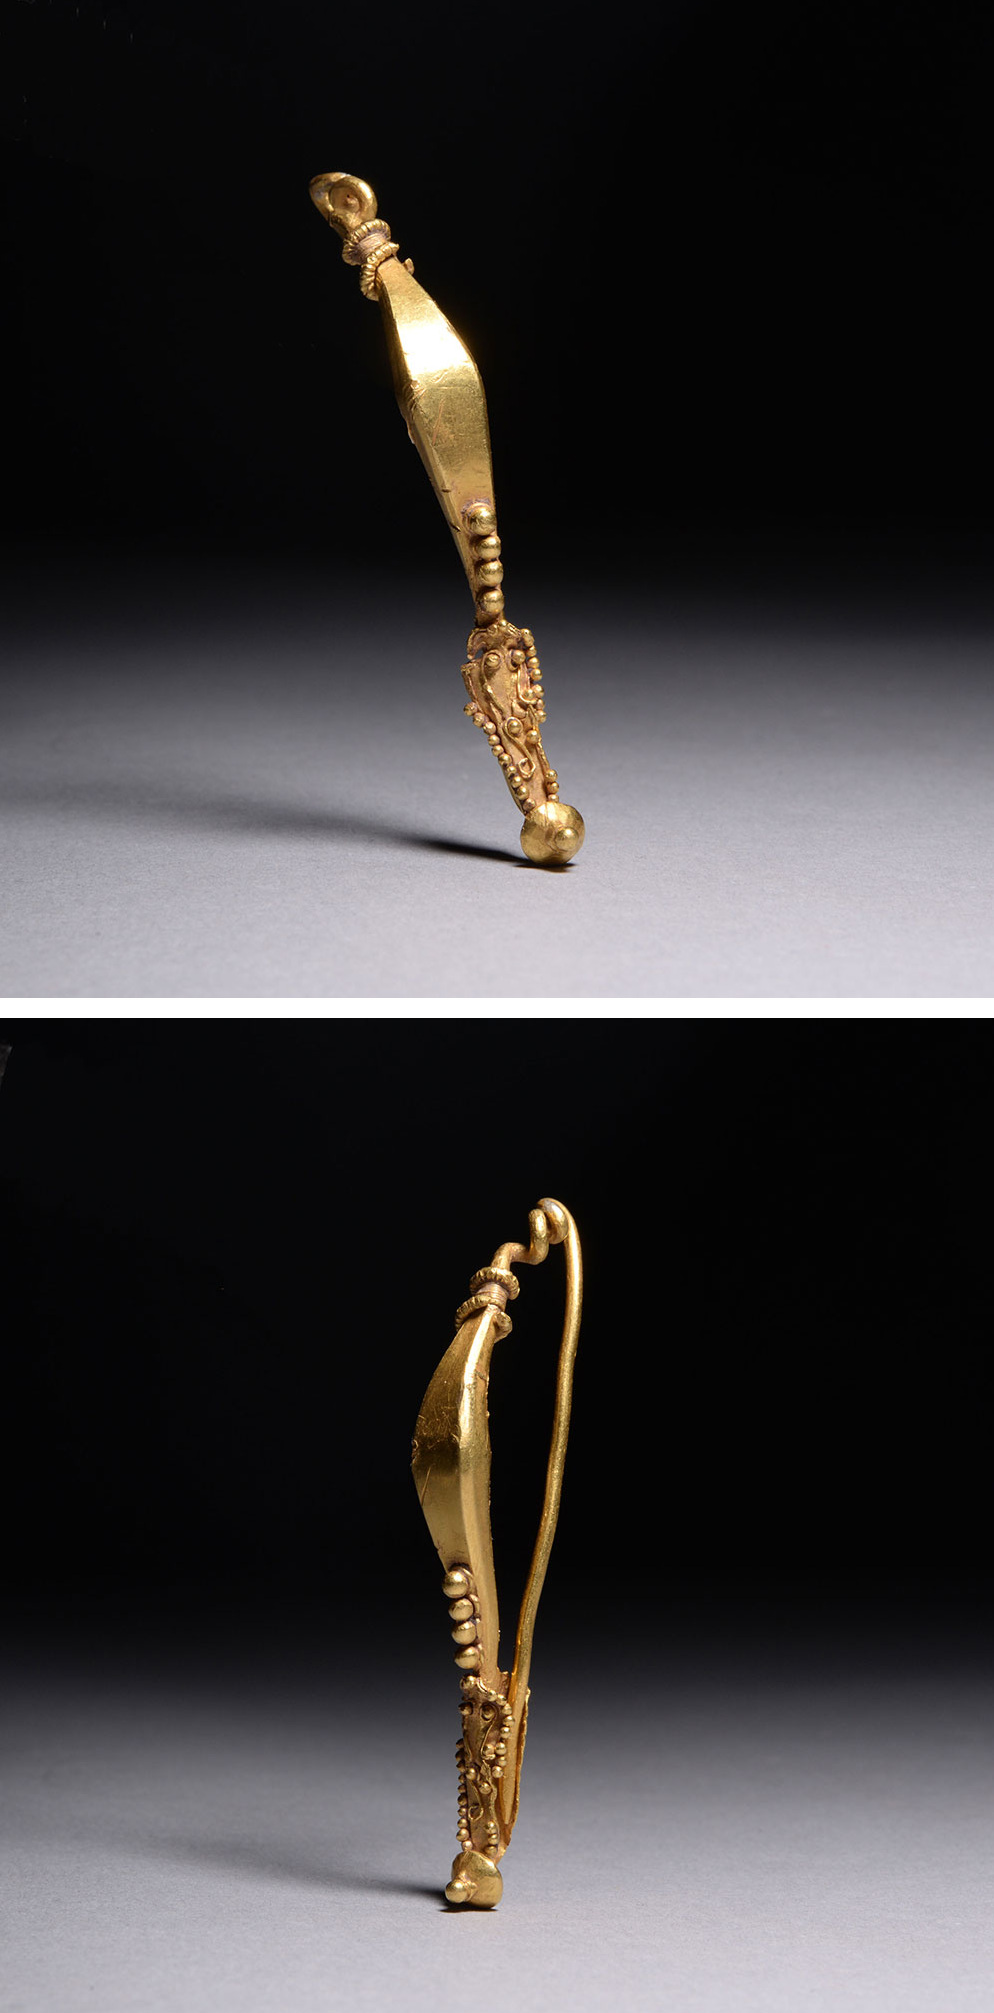 Ancient Roman Celtic La Tene Gold Brooch - 50 BC